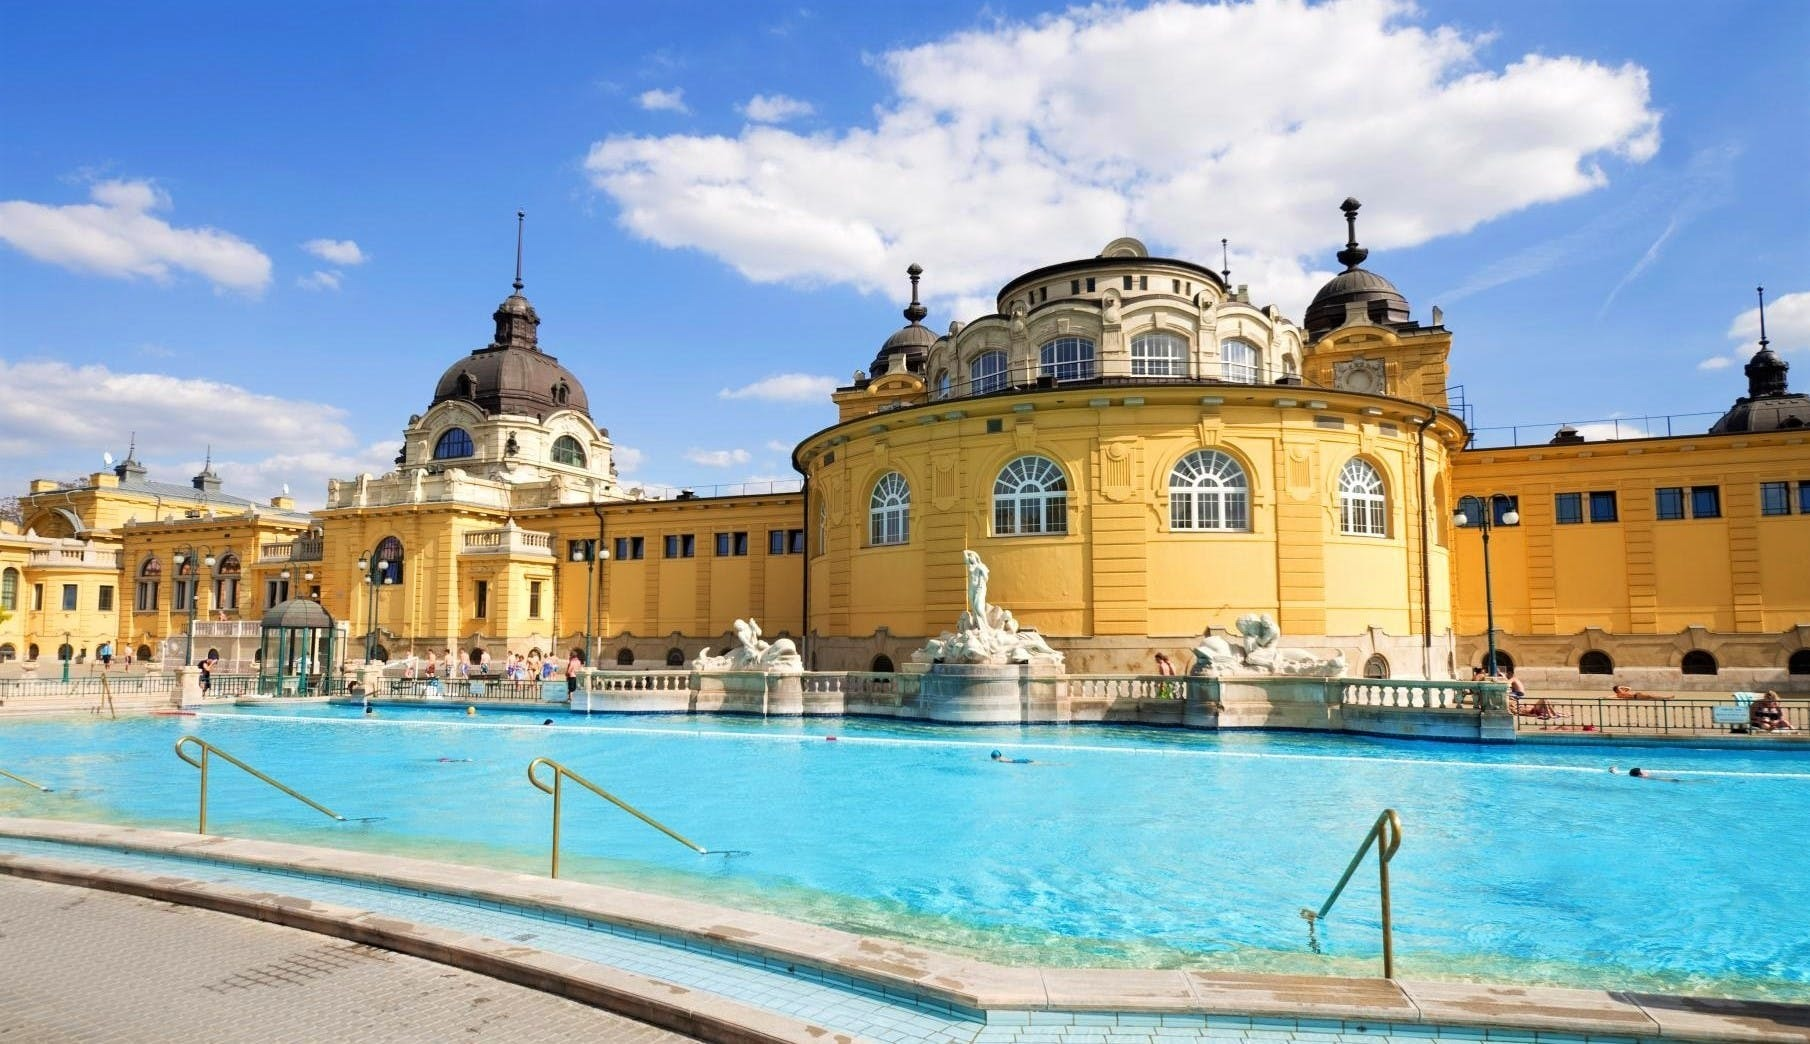 حمام Secechenyi، بوداپست، مجارستان